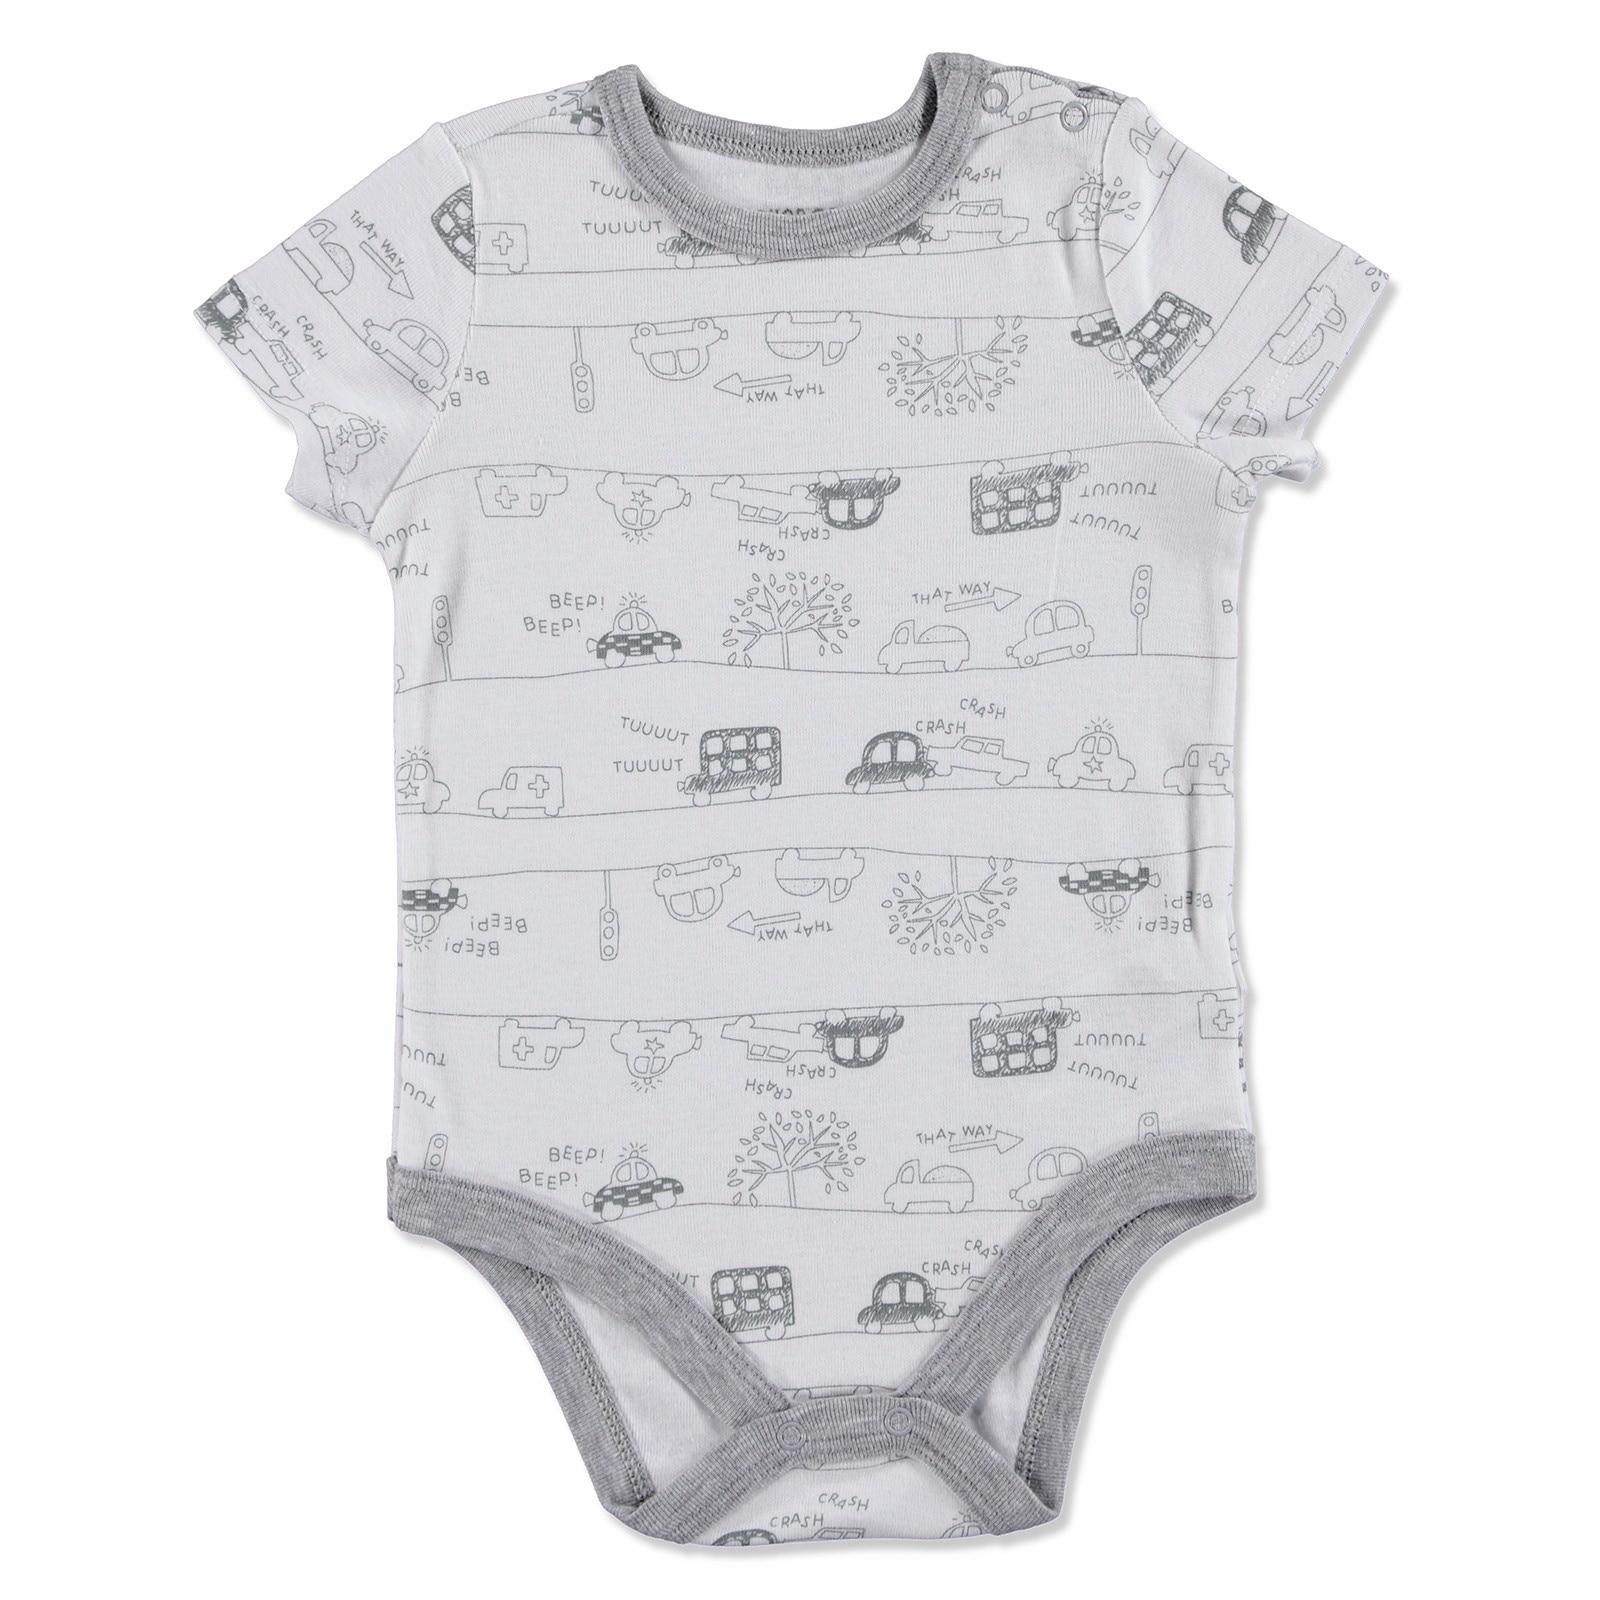 Ebebek HelloBaby Baby Printed Short Sleeve Bodysuit